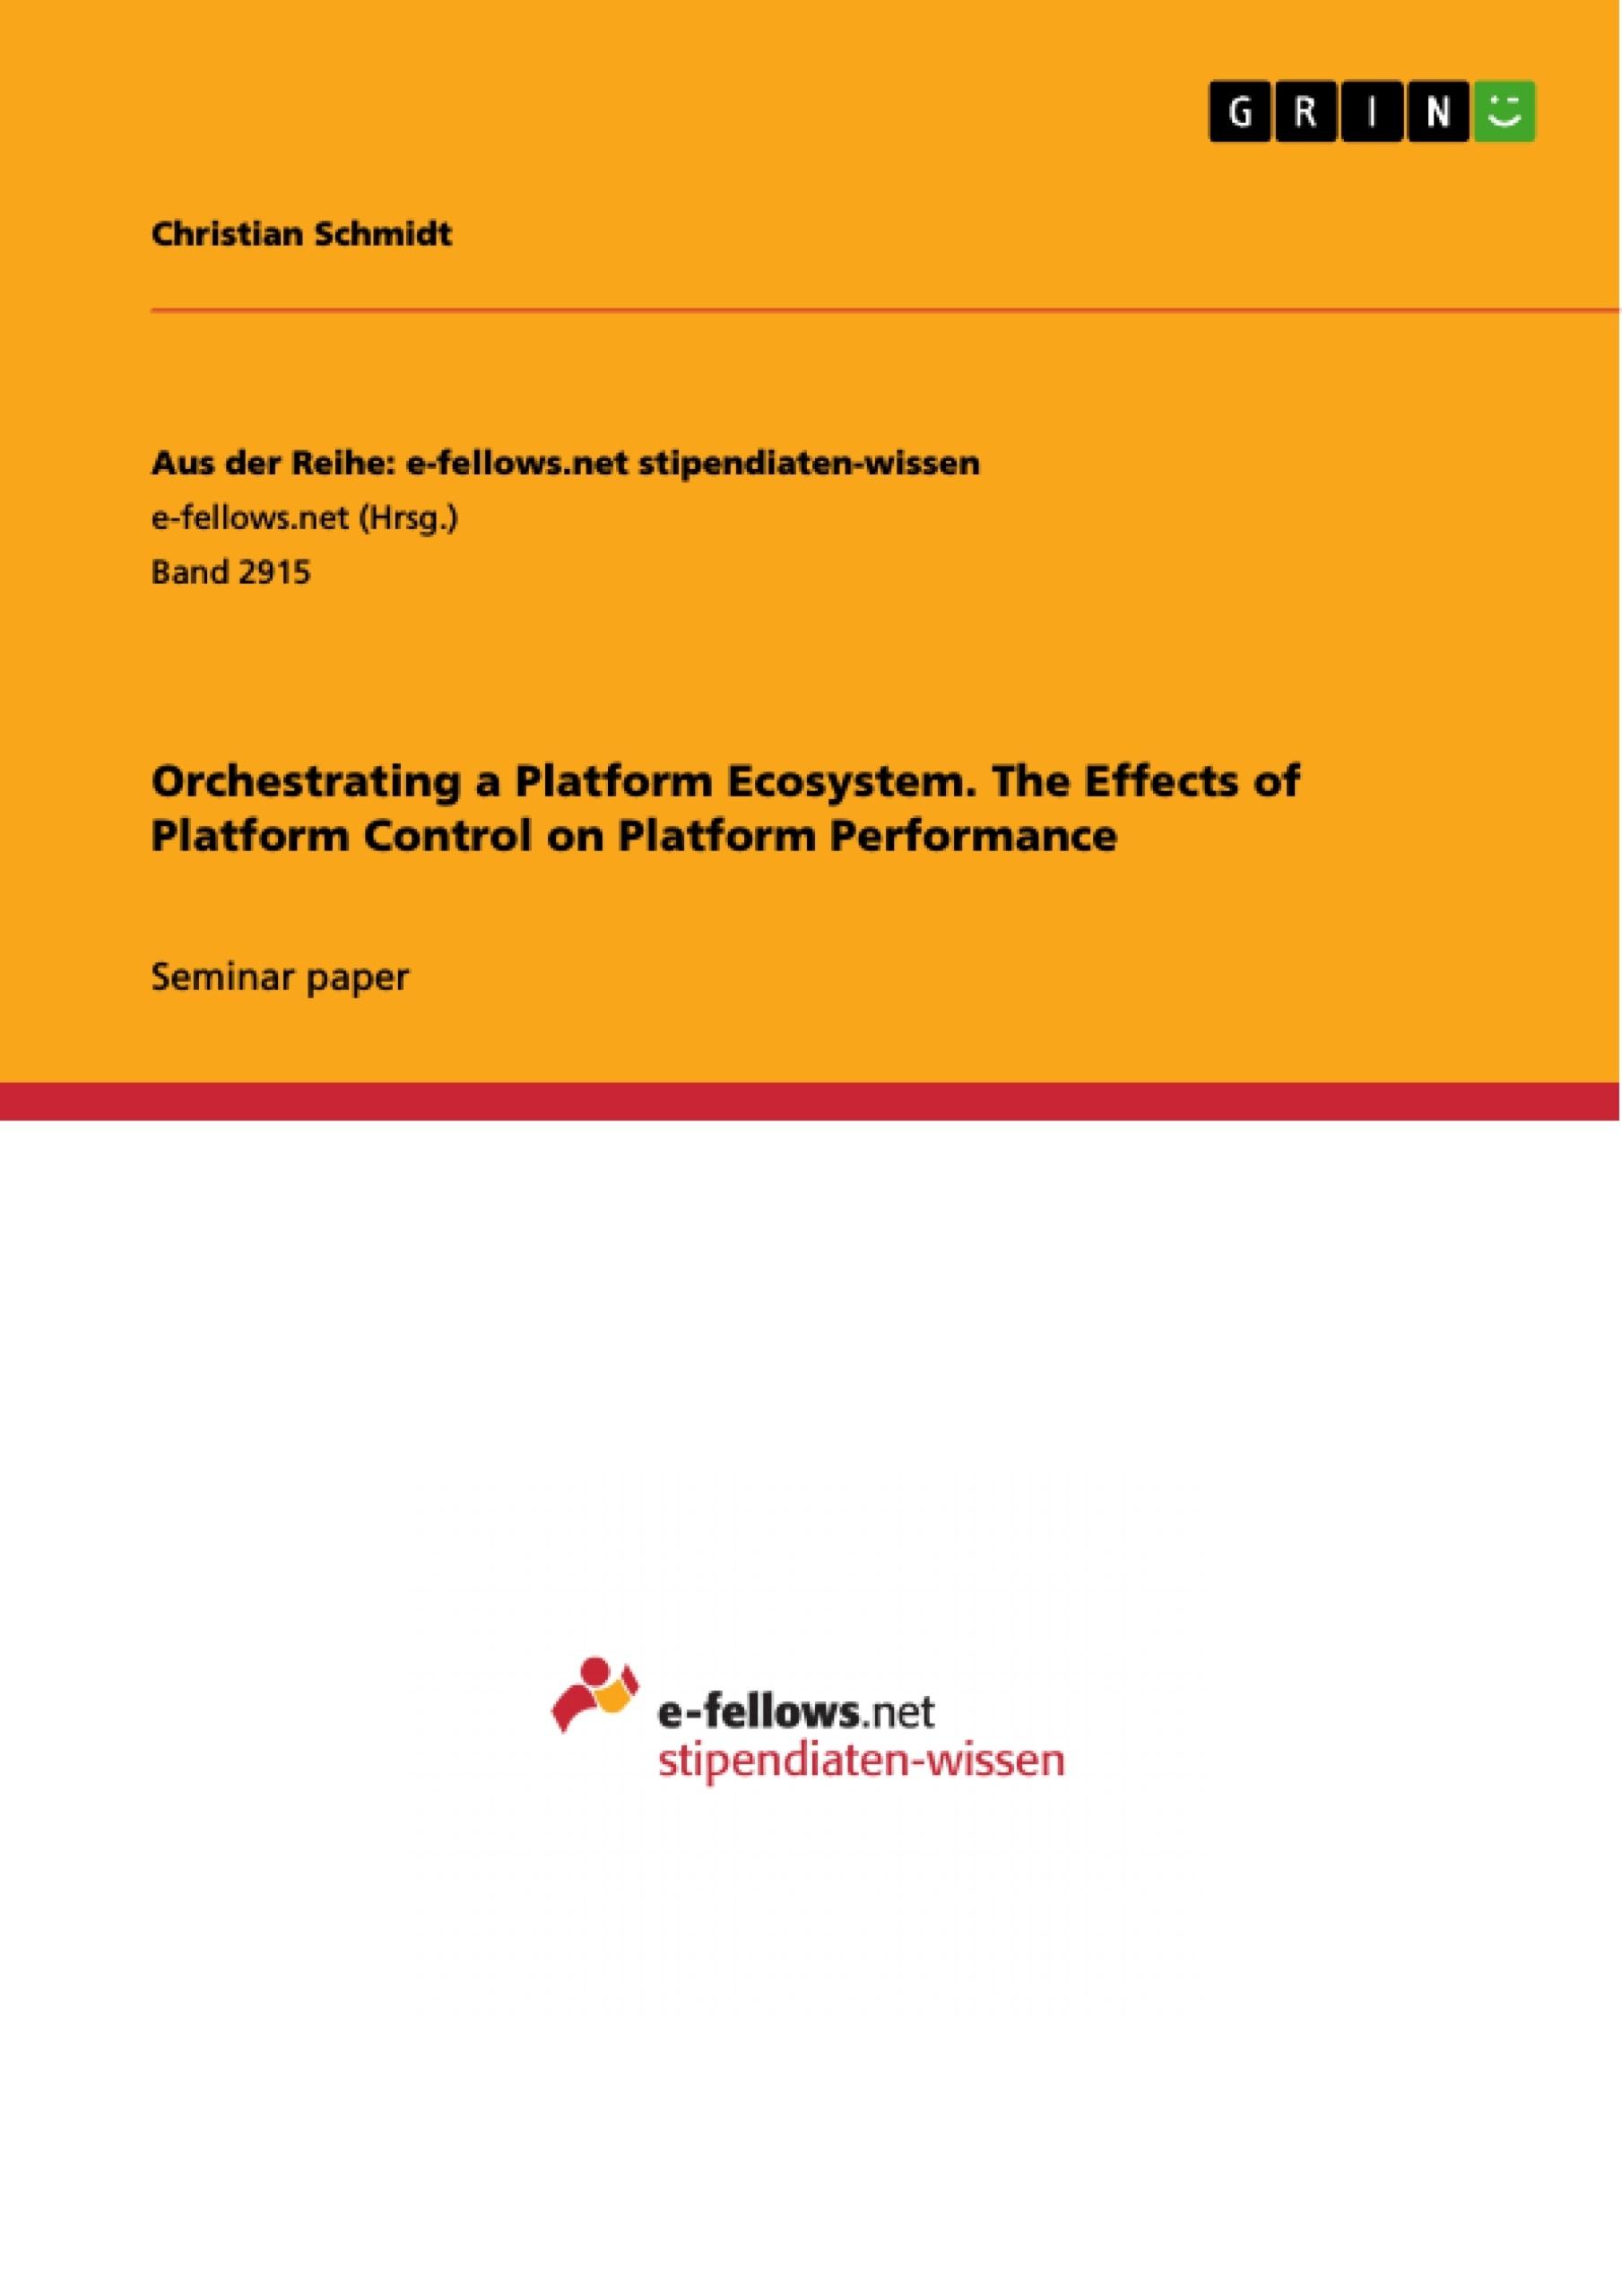 Title: Orchestrating a Platform Ecosystem. The Effects of Platform Control on Platform Performance